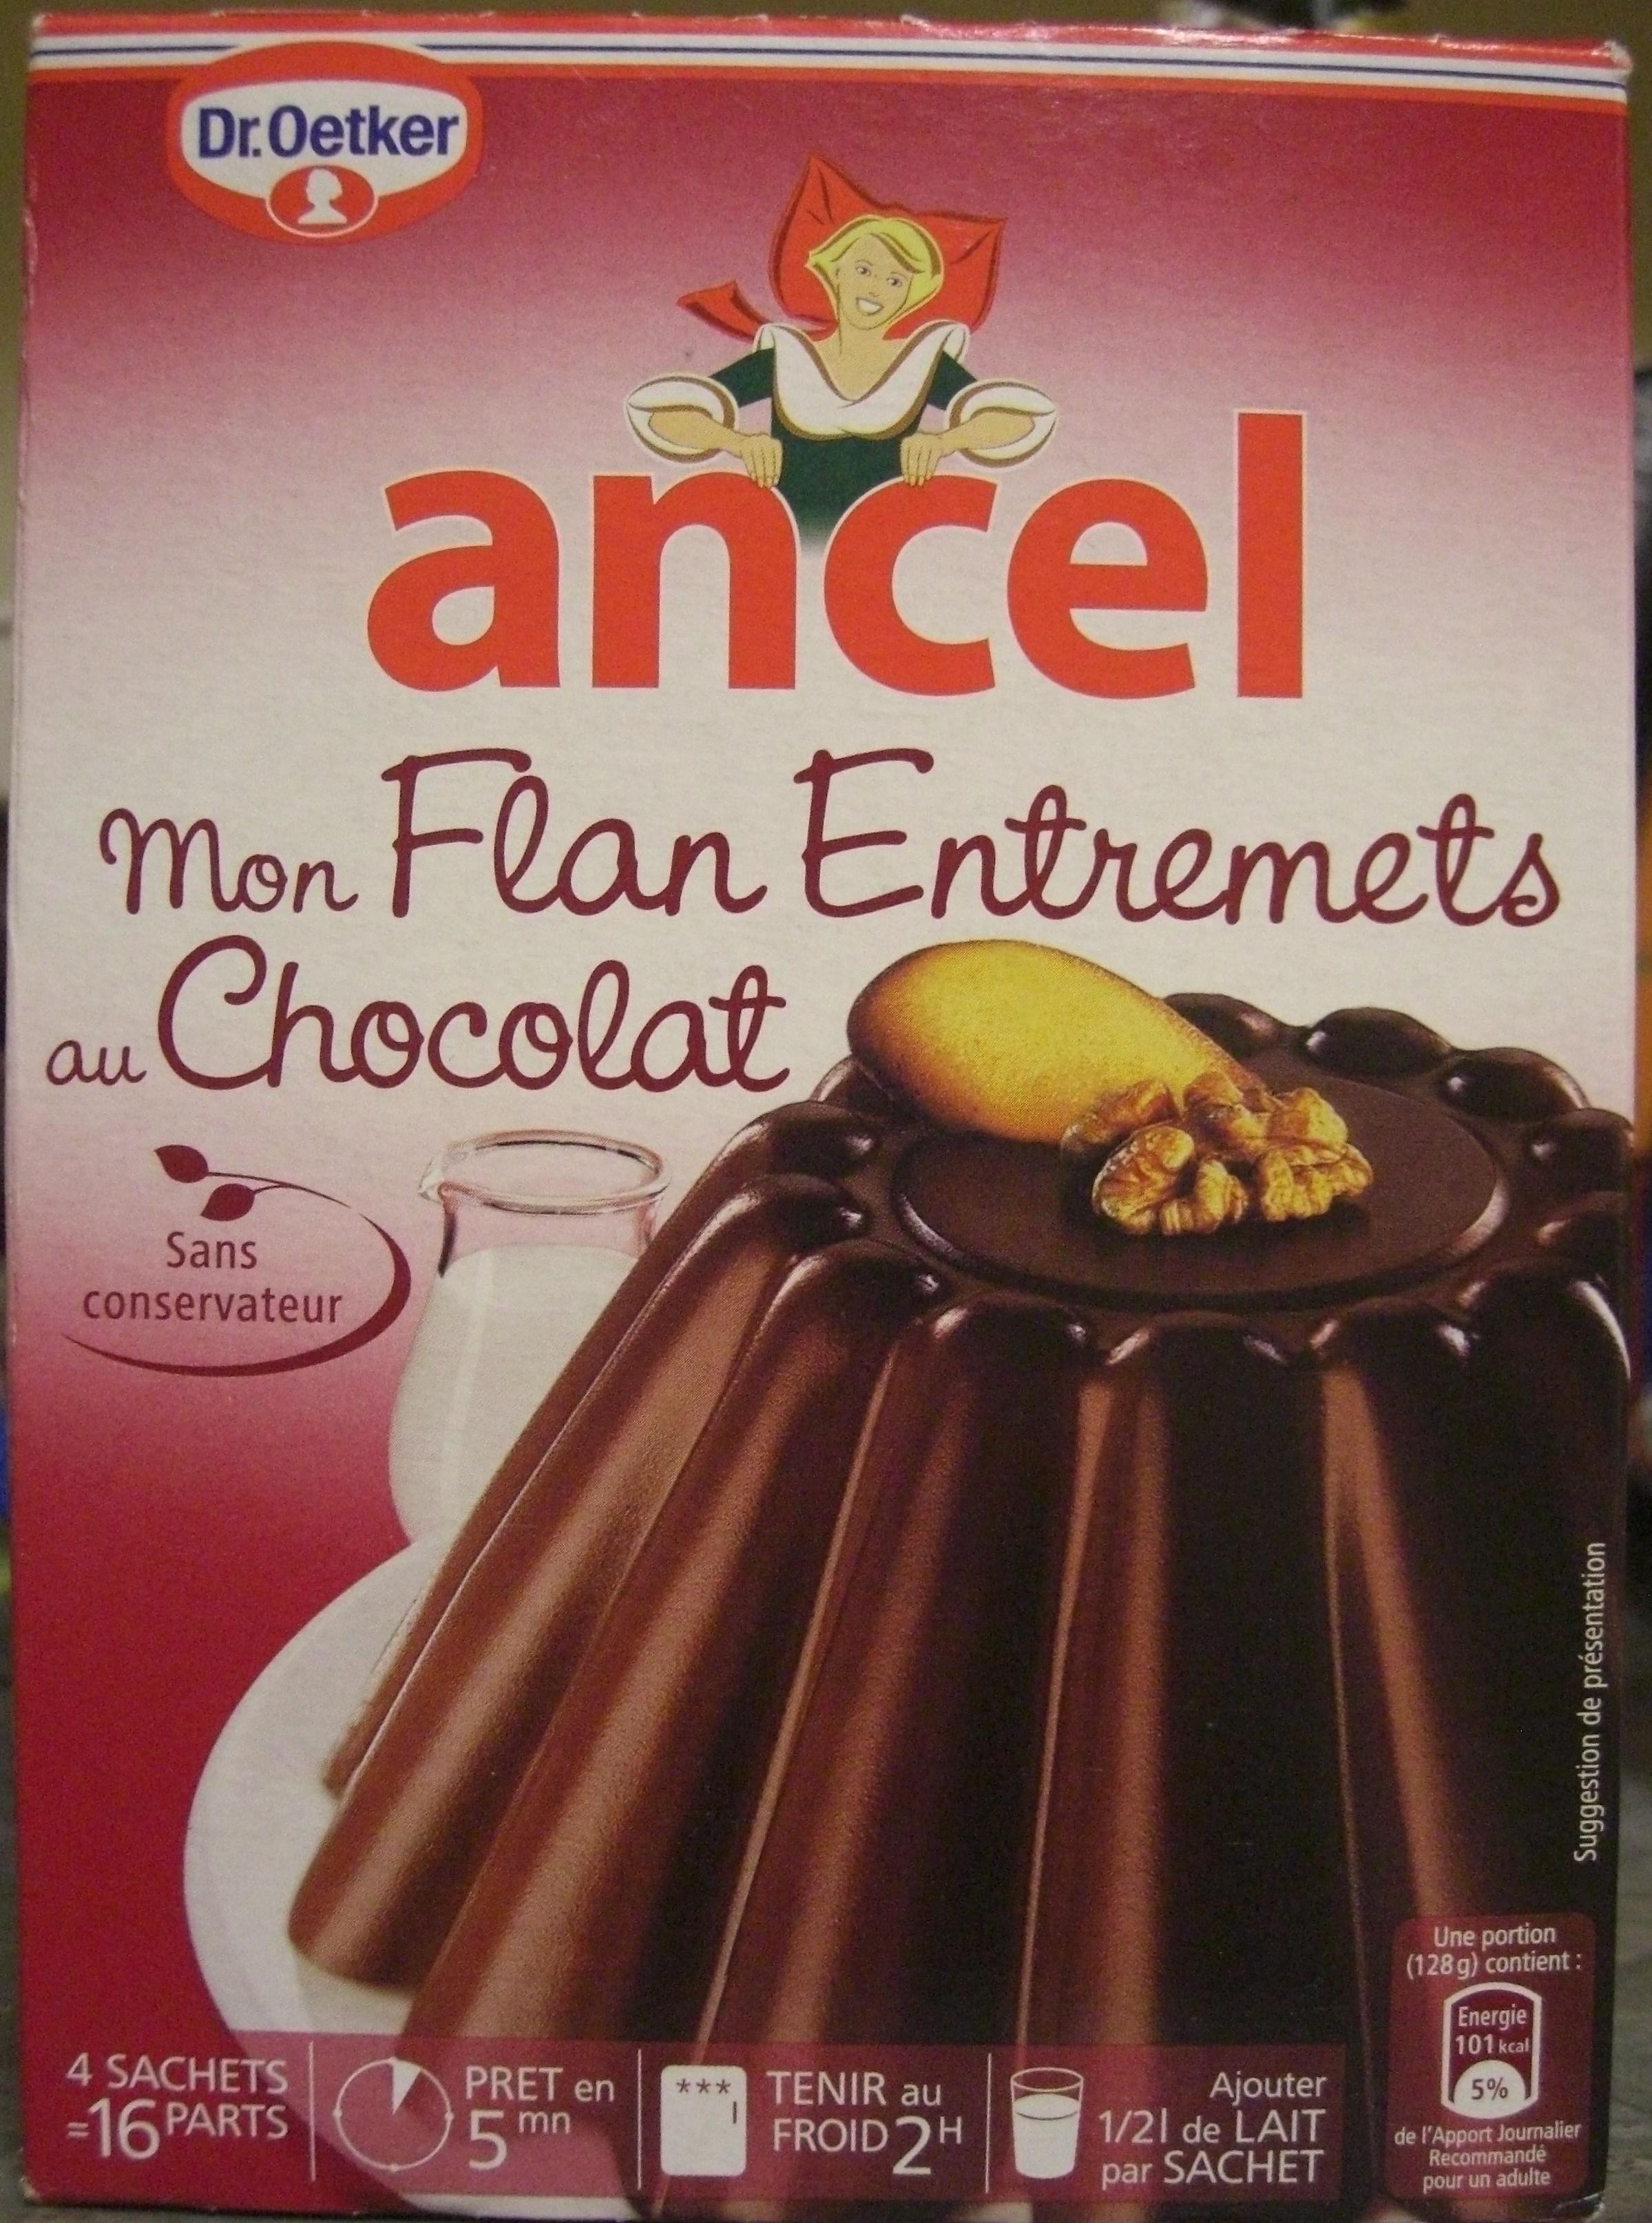 Mon flan entremets au chocolat - Ancel - 232g